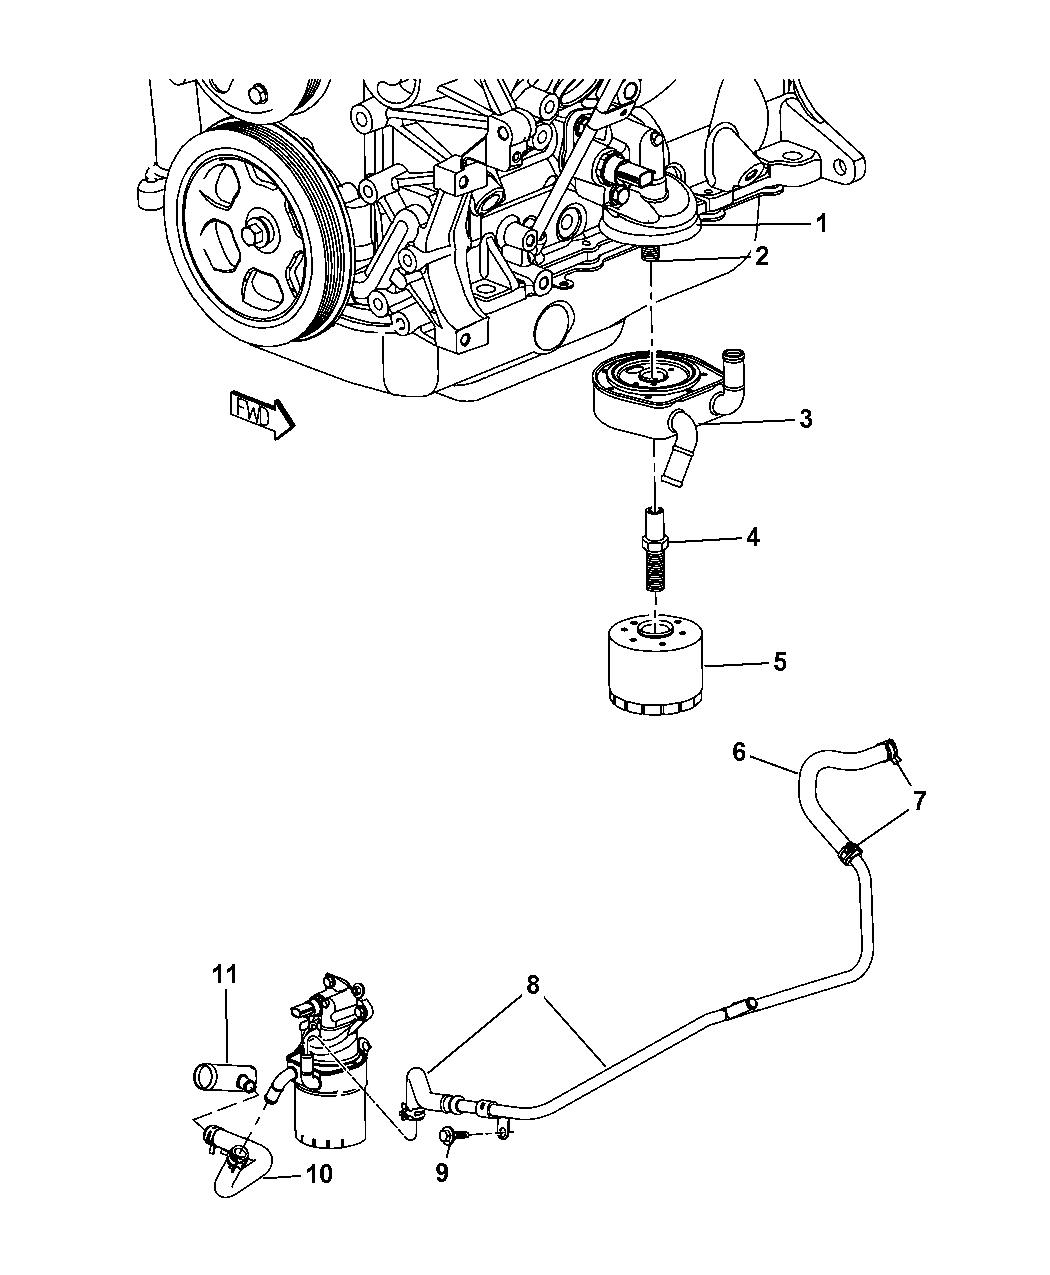 Pacifica Rear Suspension Diagram On Pt Cruiser Fuse Box Diagram 2003